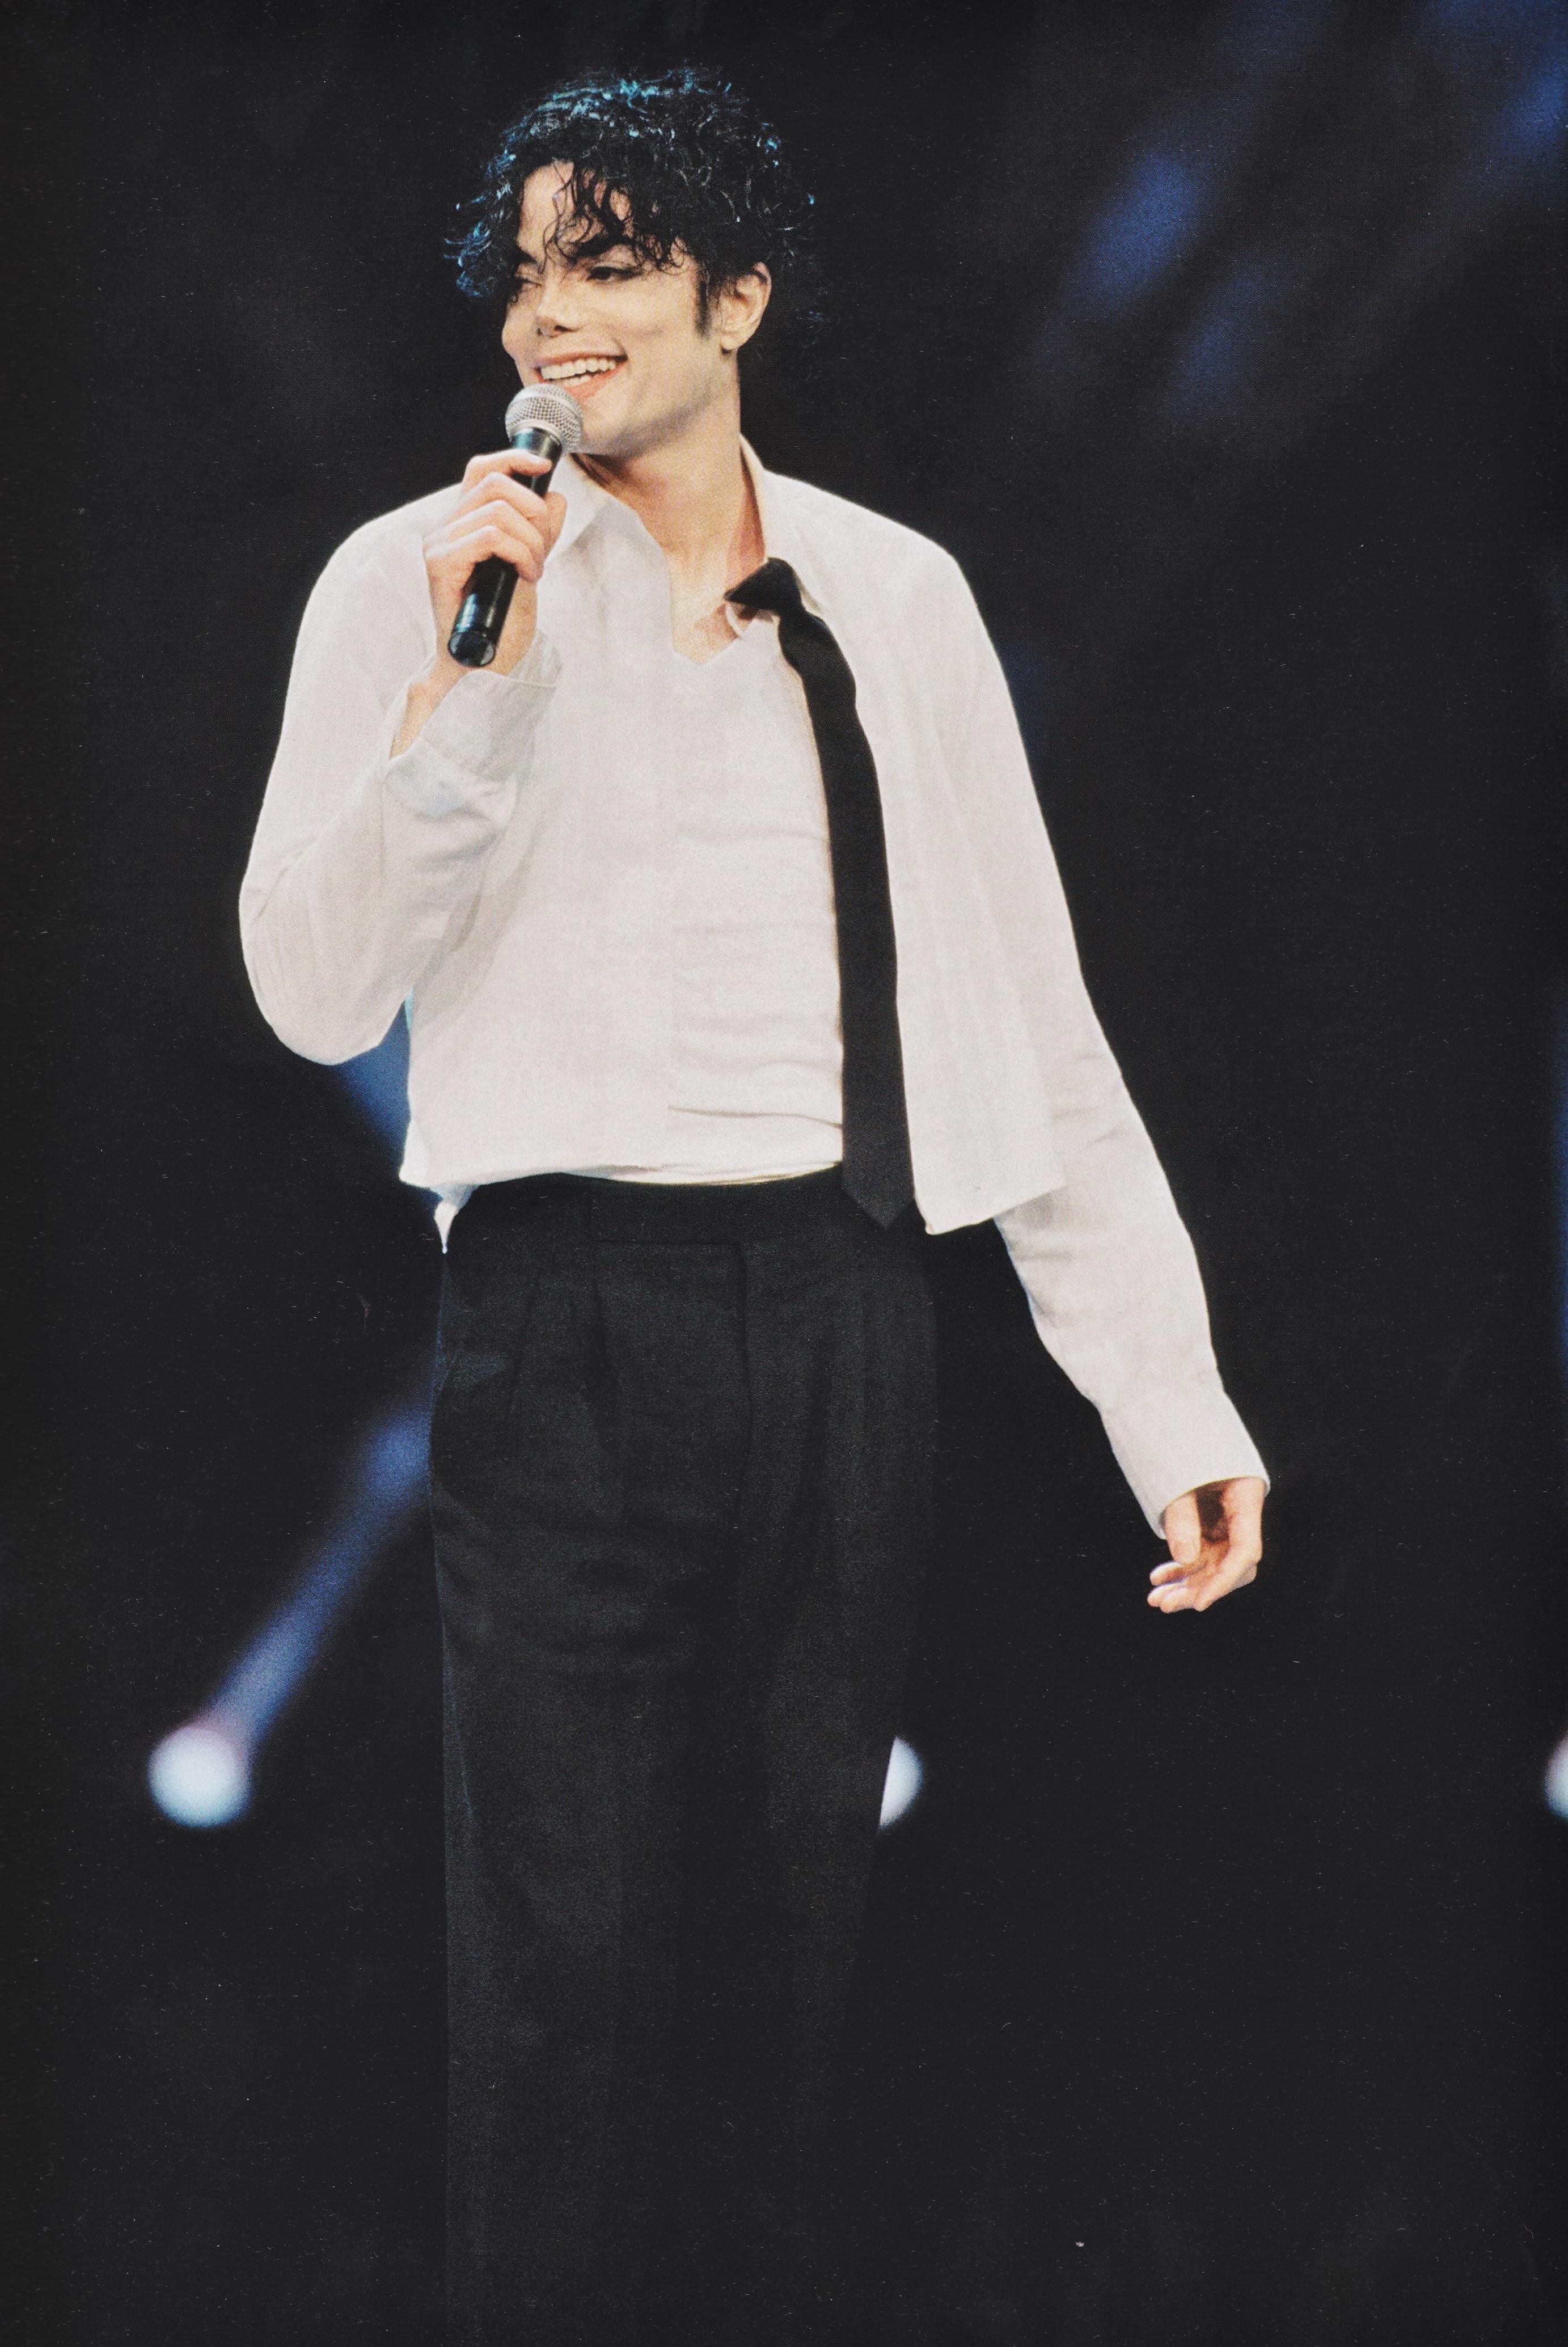 Michael Jackson - HQ Scan - The 12th Annual MTV Video muziki Awards'95